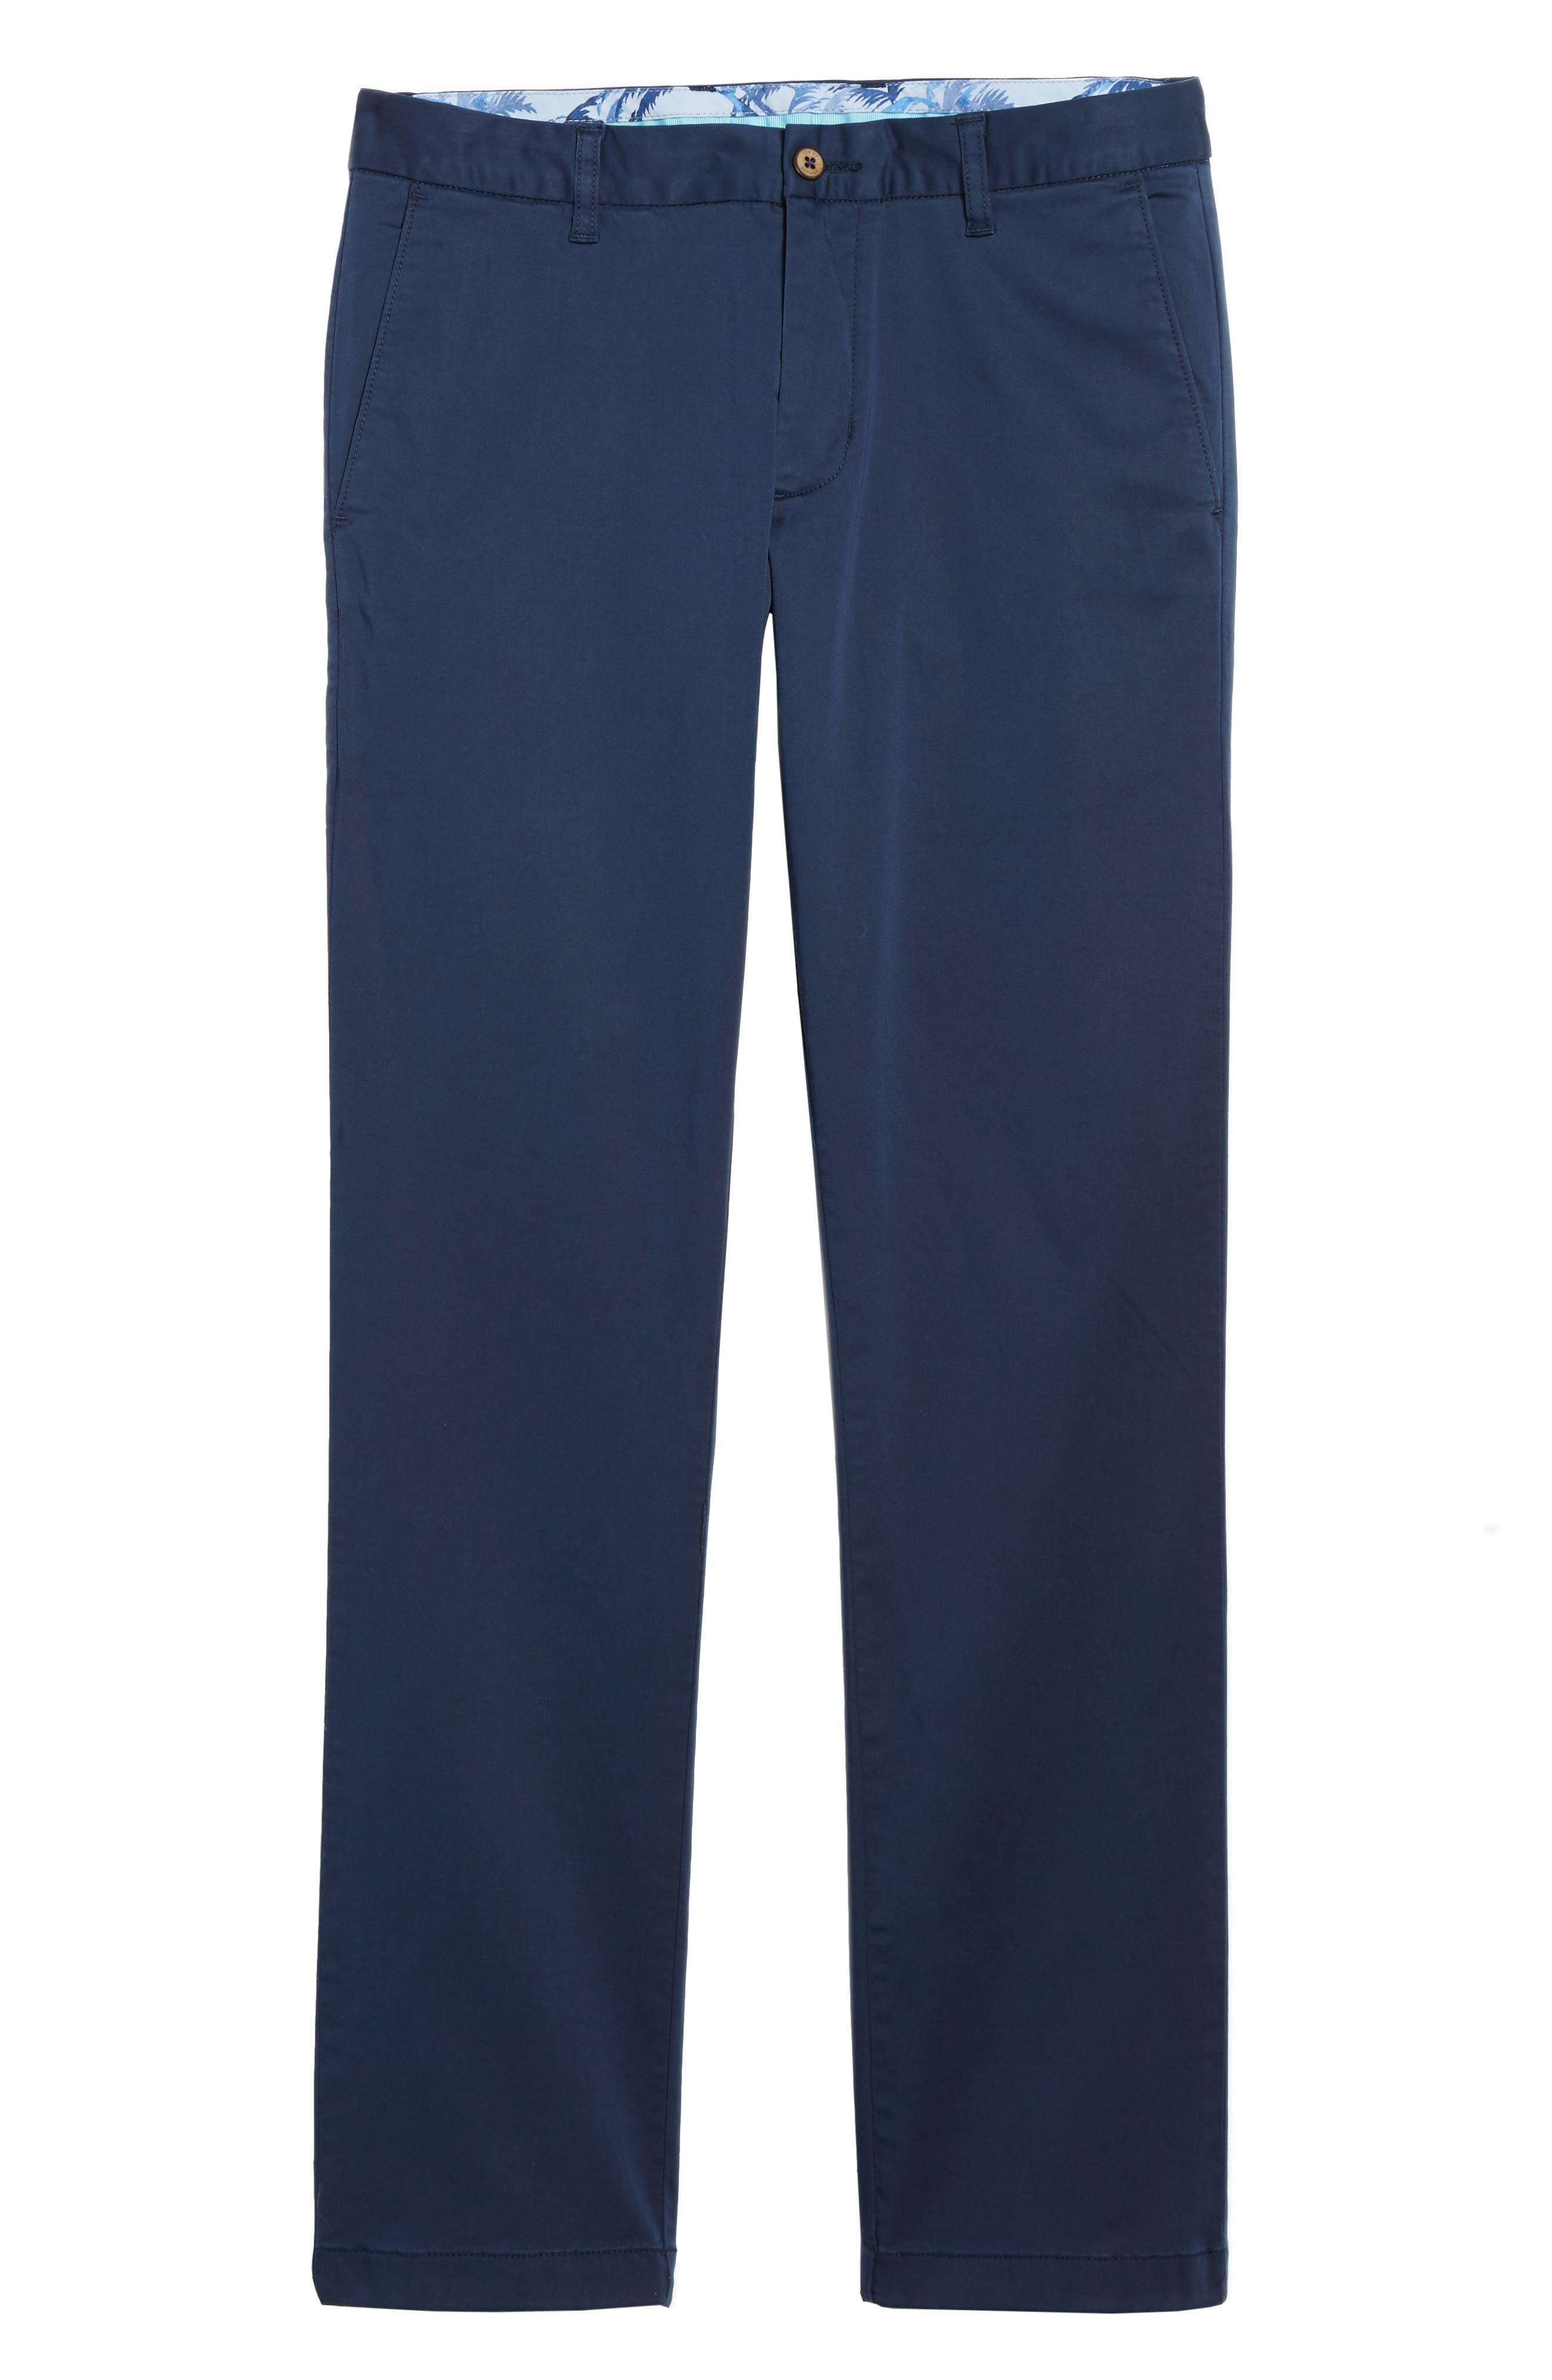 Boracay Flat Front Pants,                             Alternate thumbnail 6, color,                             Maritime